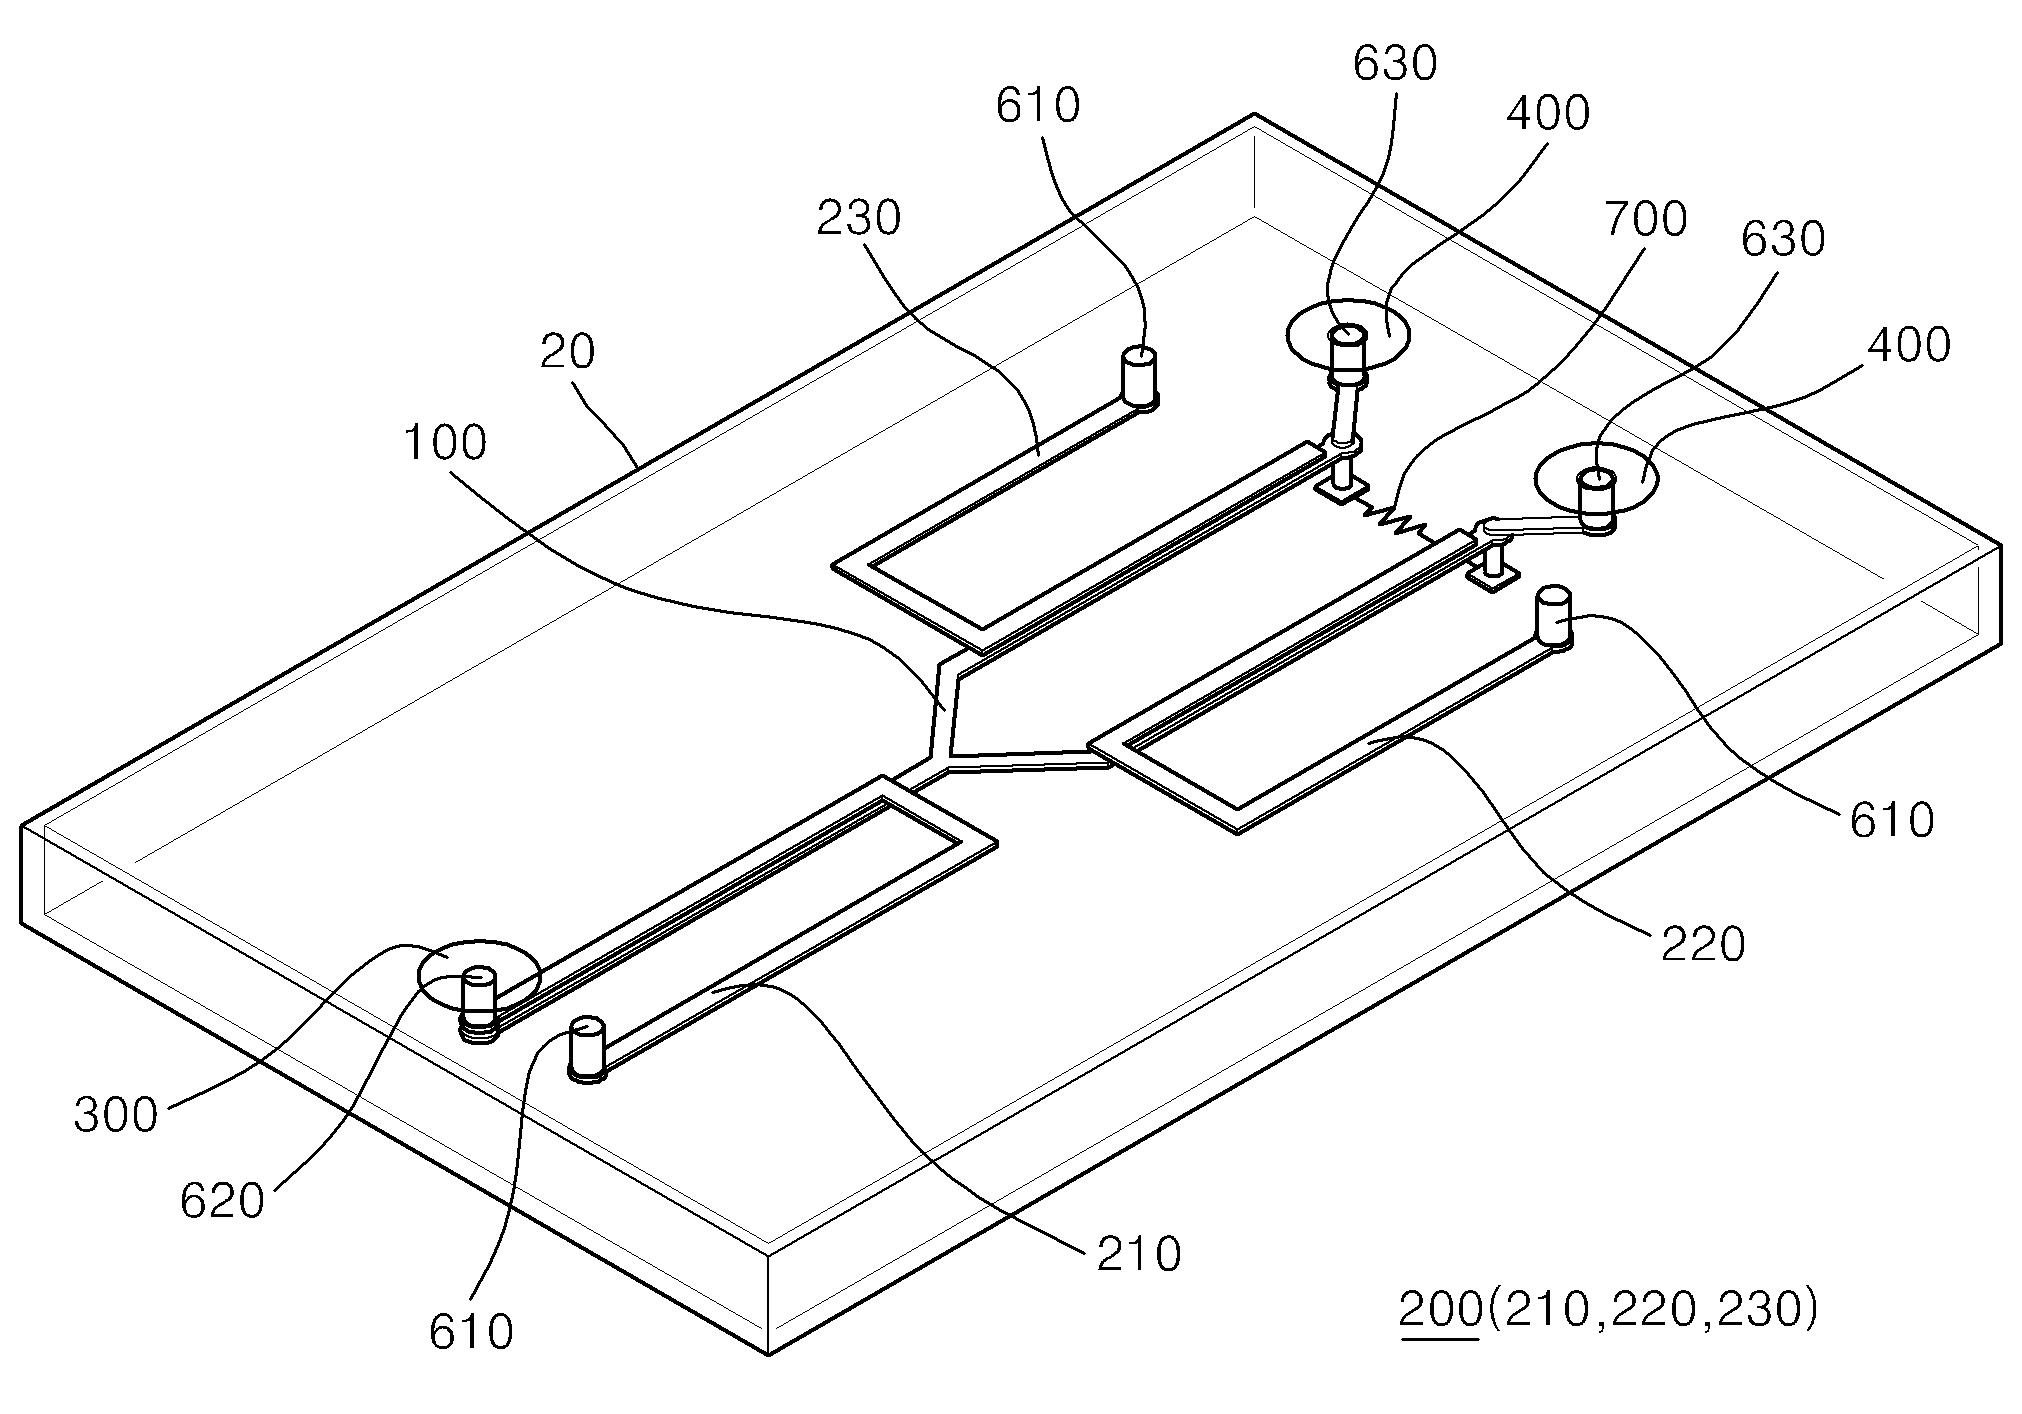 patent wo2010137820a2